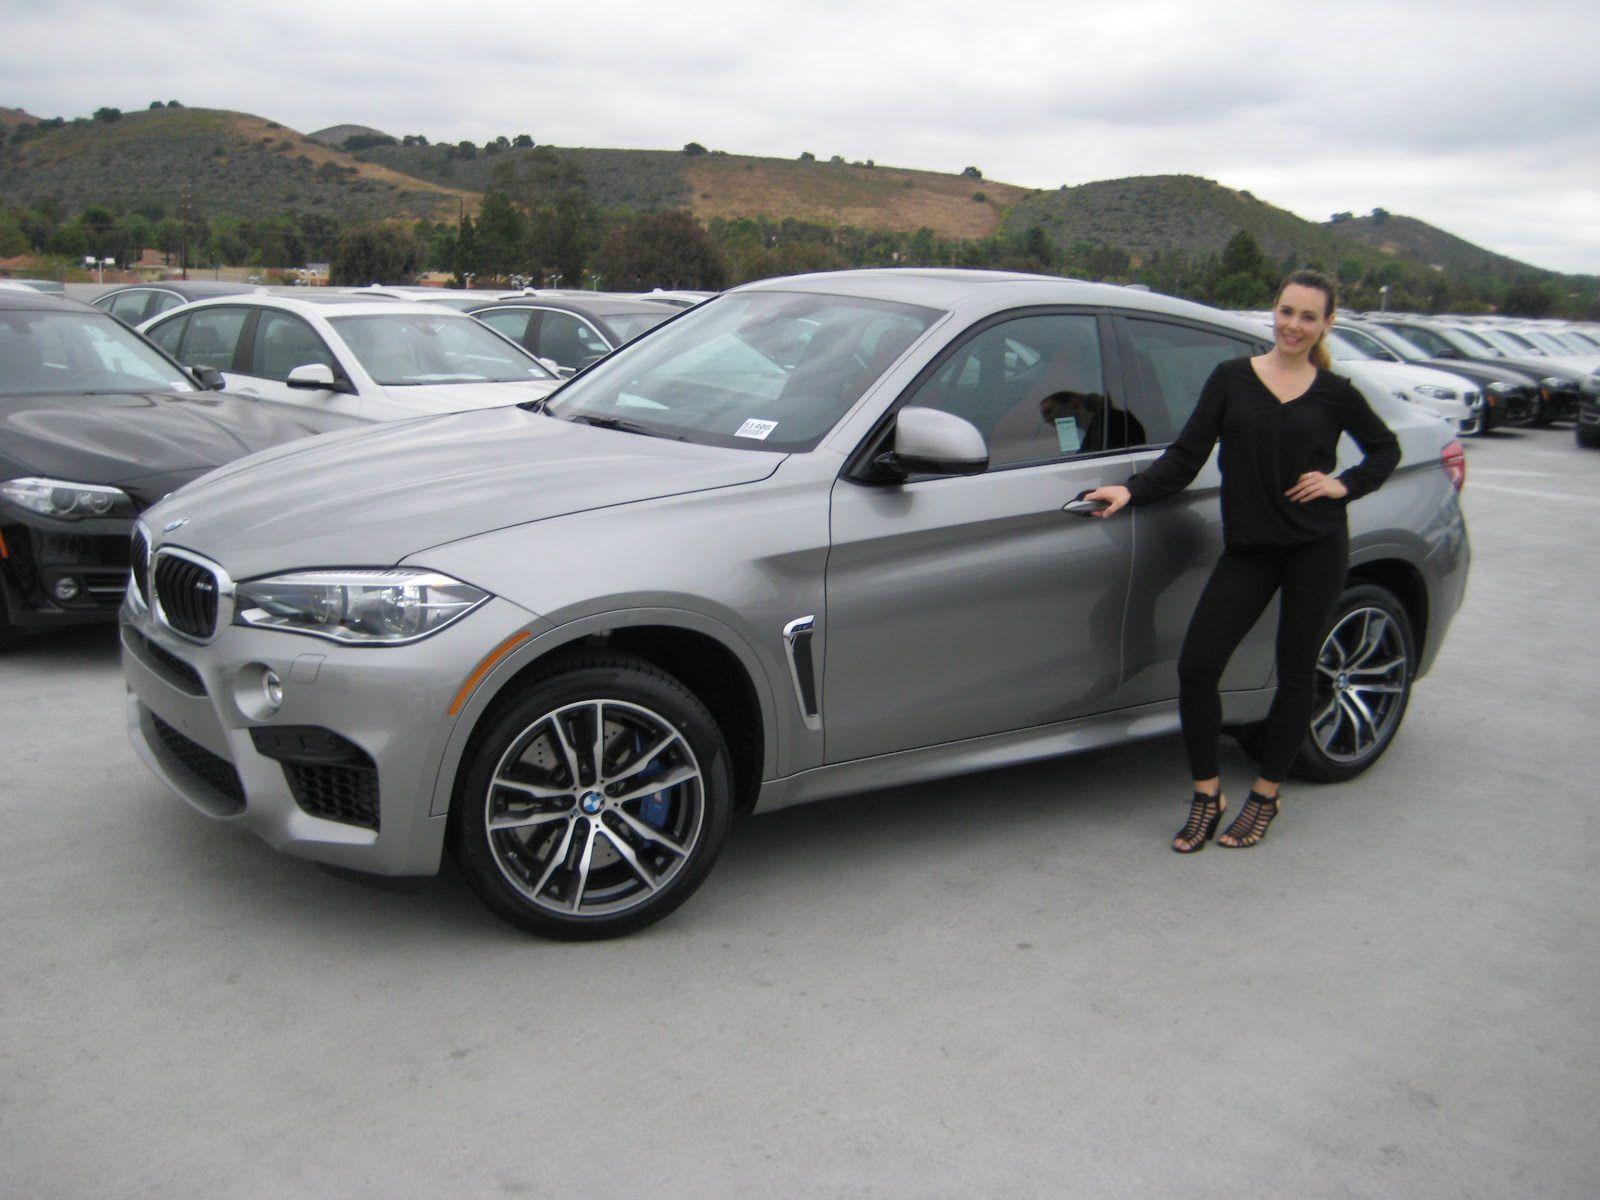 all new bmw x6 m donington grey mugello red leather exhaust rh pinterest de